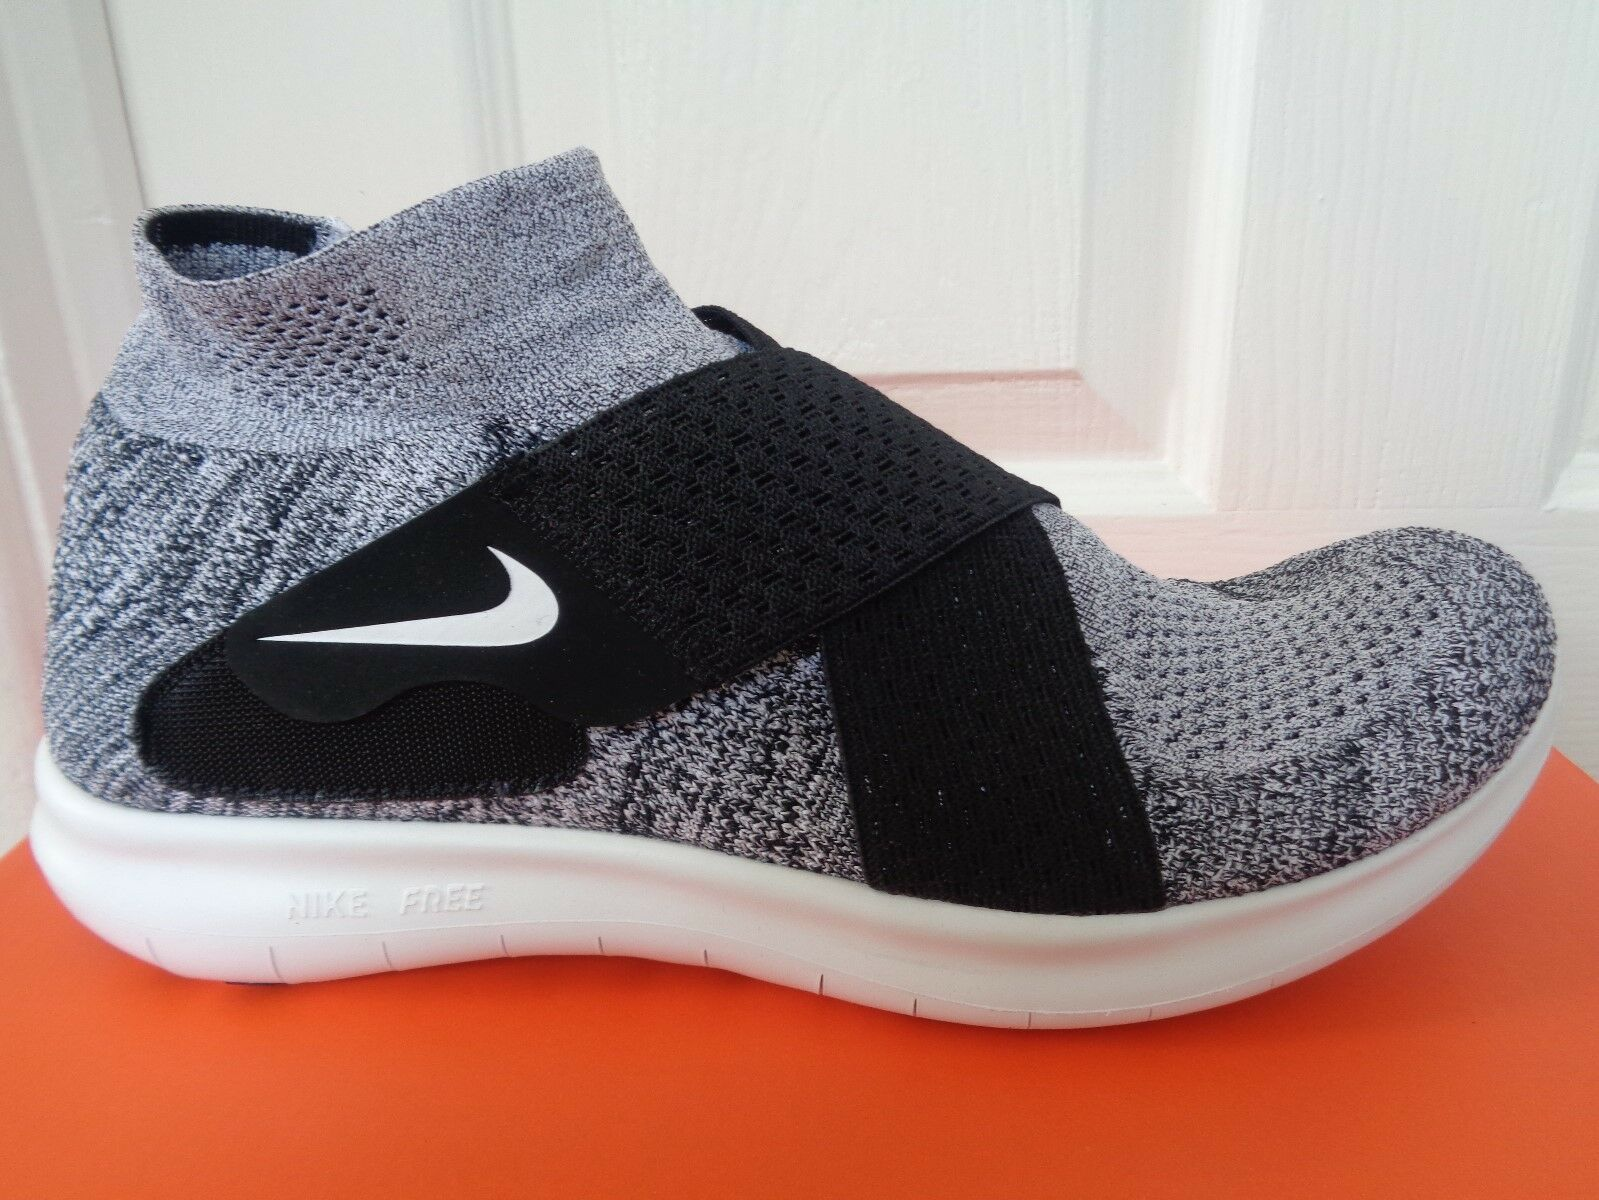 Nike Free RN Motion FK 2017 trainers shoes 880845 001 eu 42 us 8.5 NEW